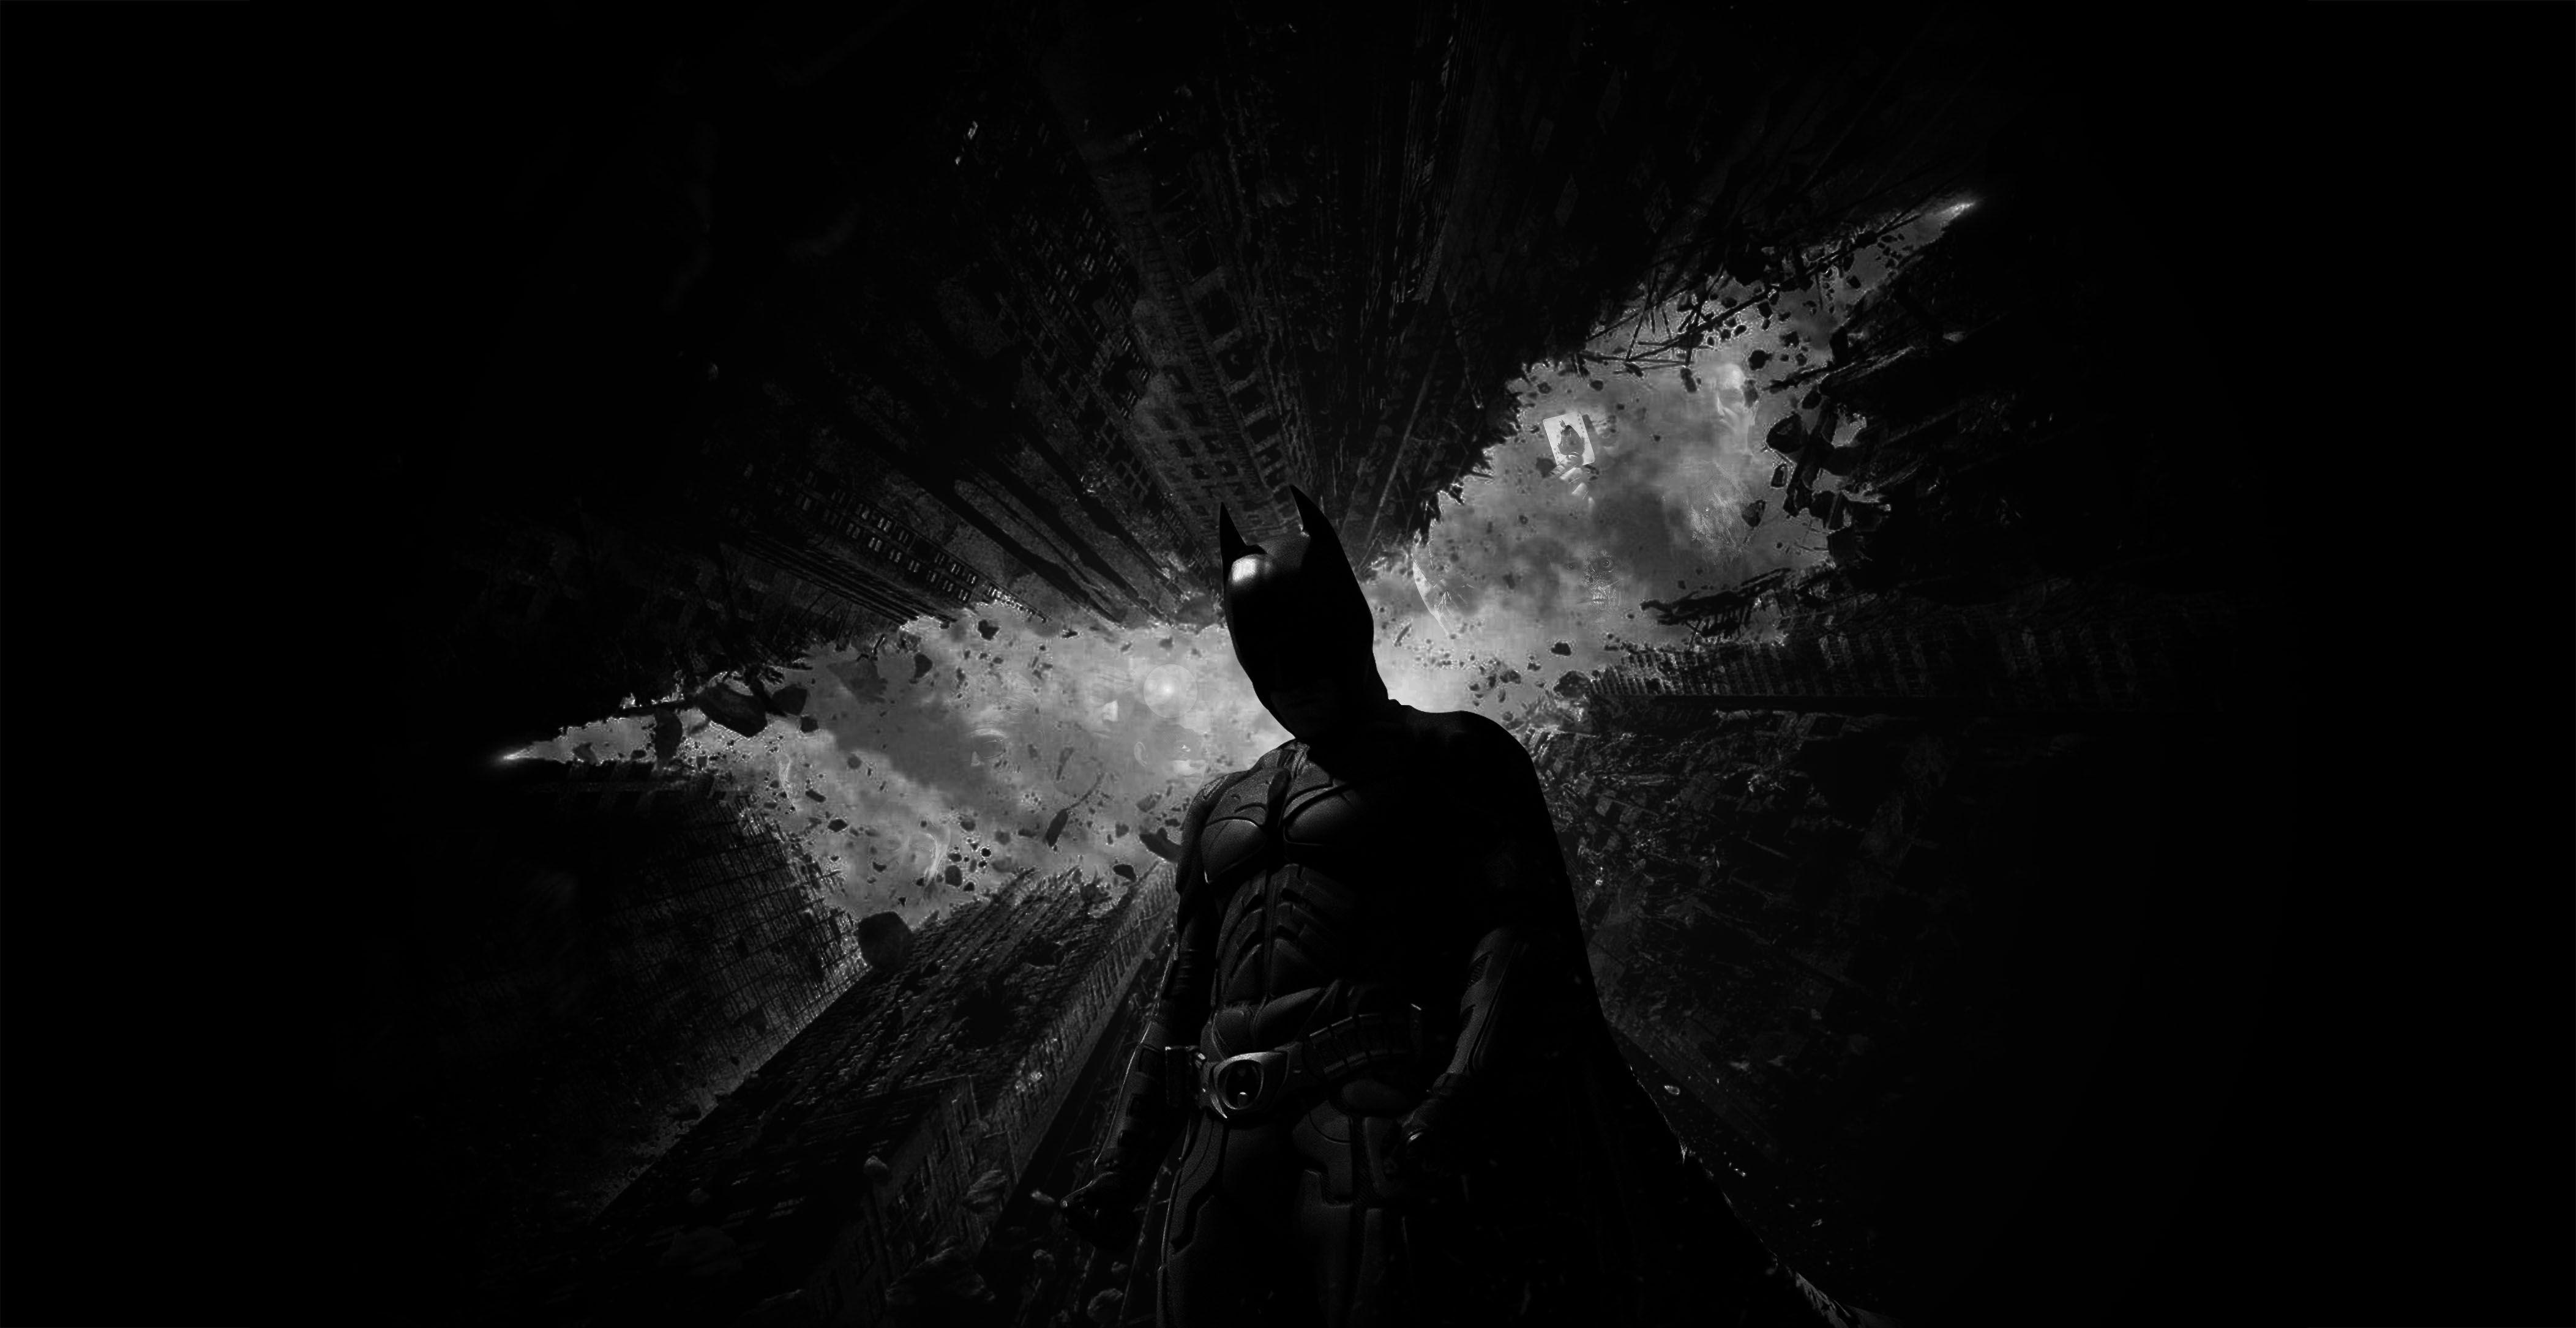 People 4208x2170 The Dark Knight Rises Batman dark Christian Bale